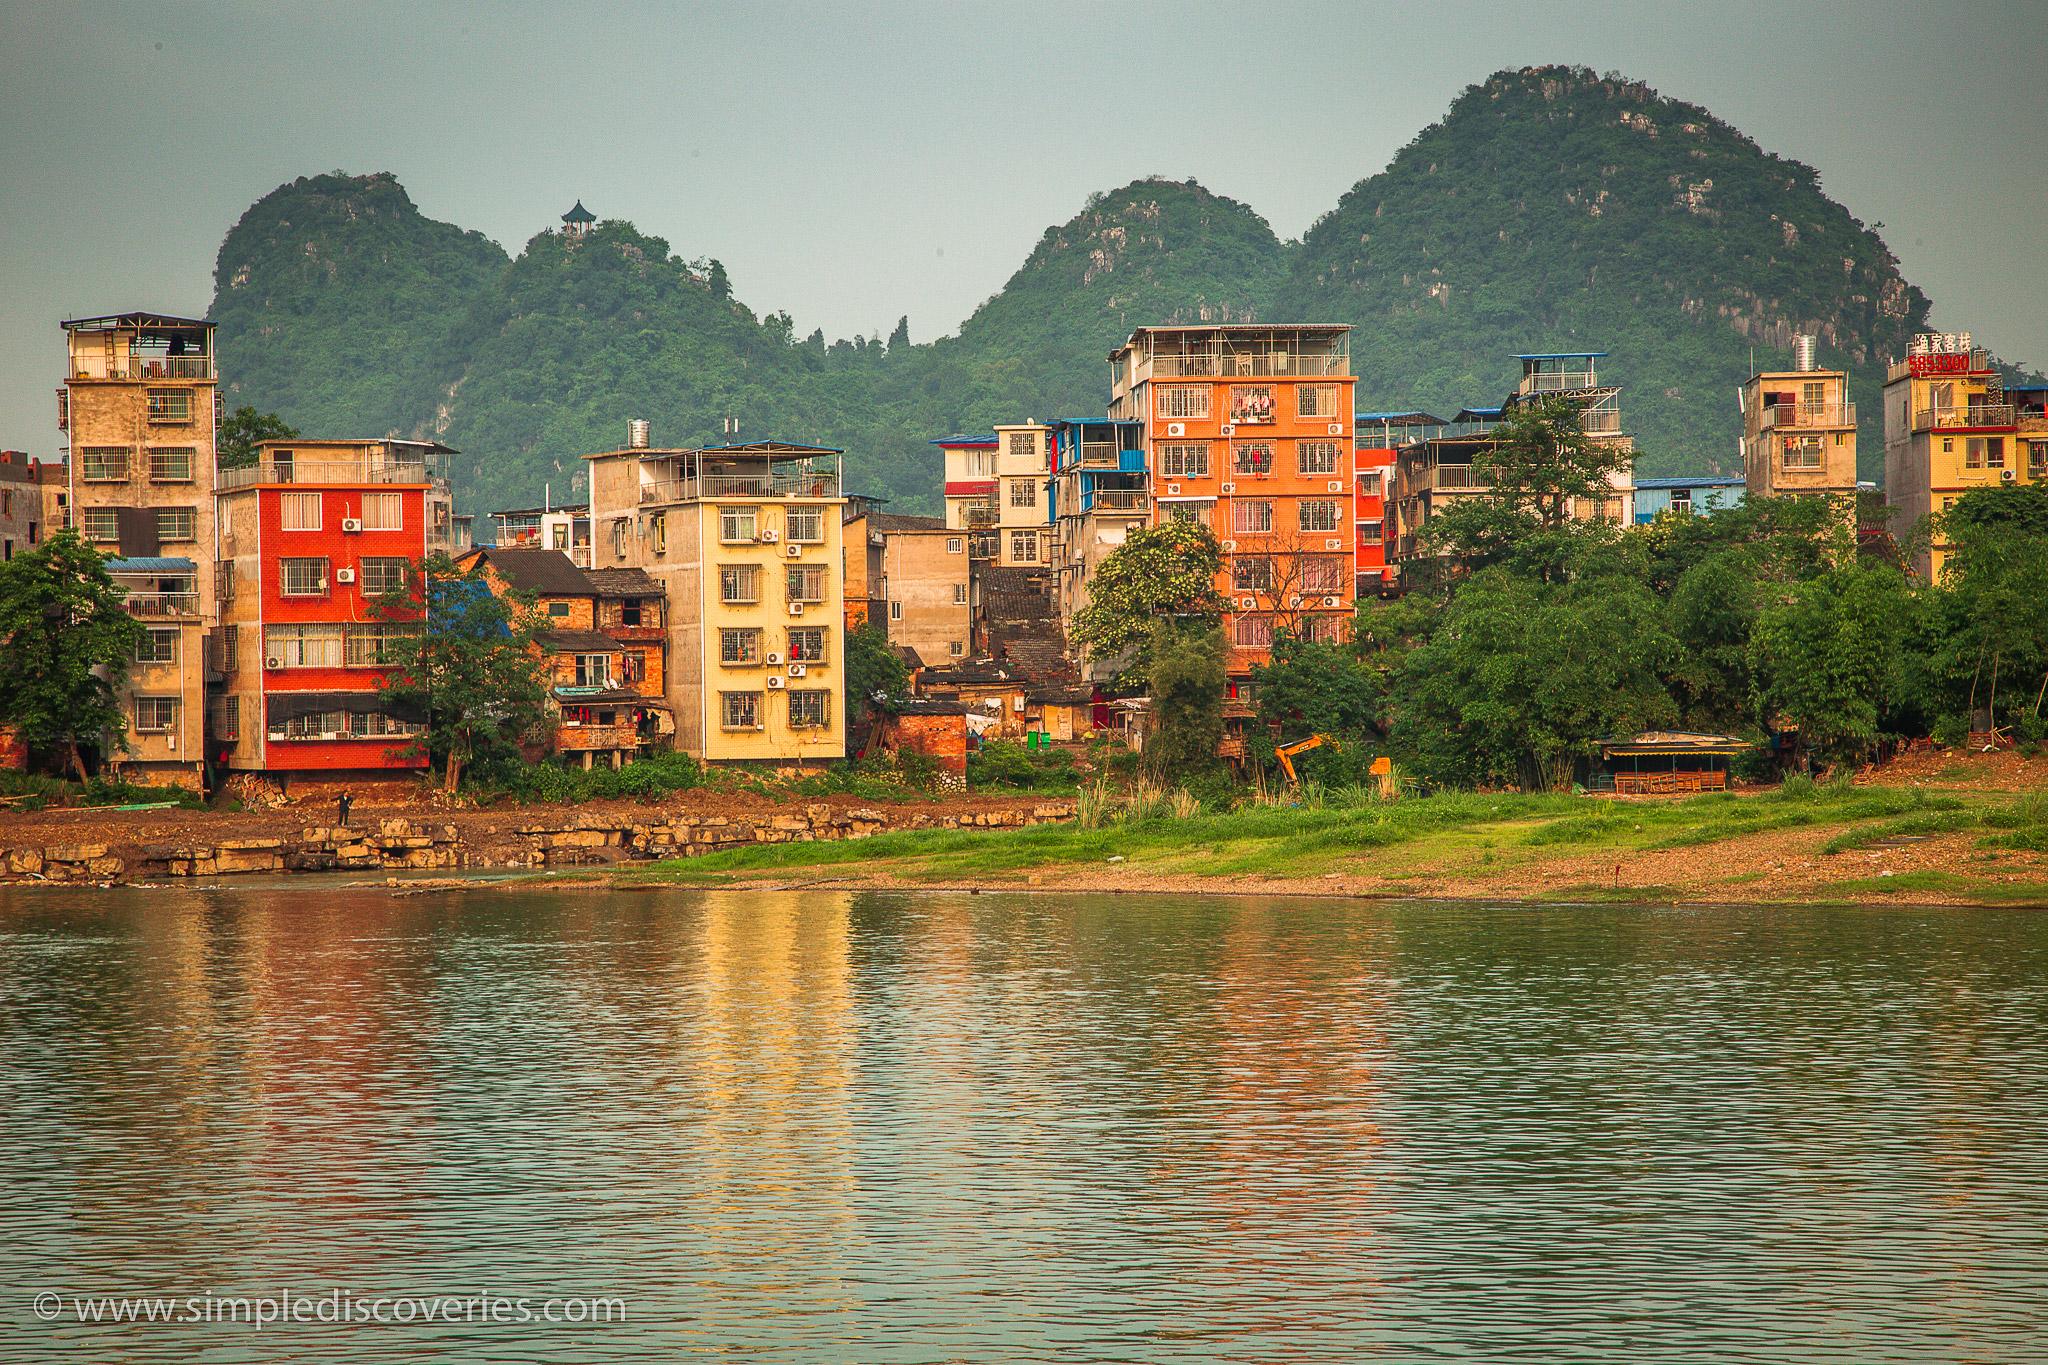 guilin_china_buildings